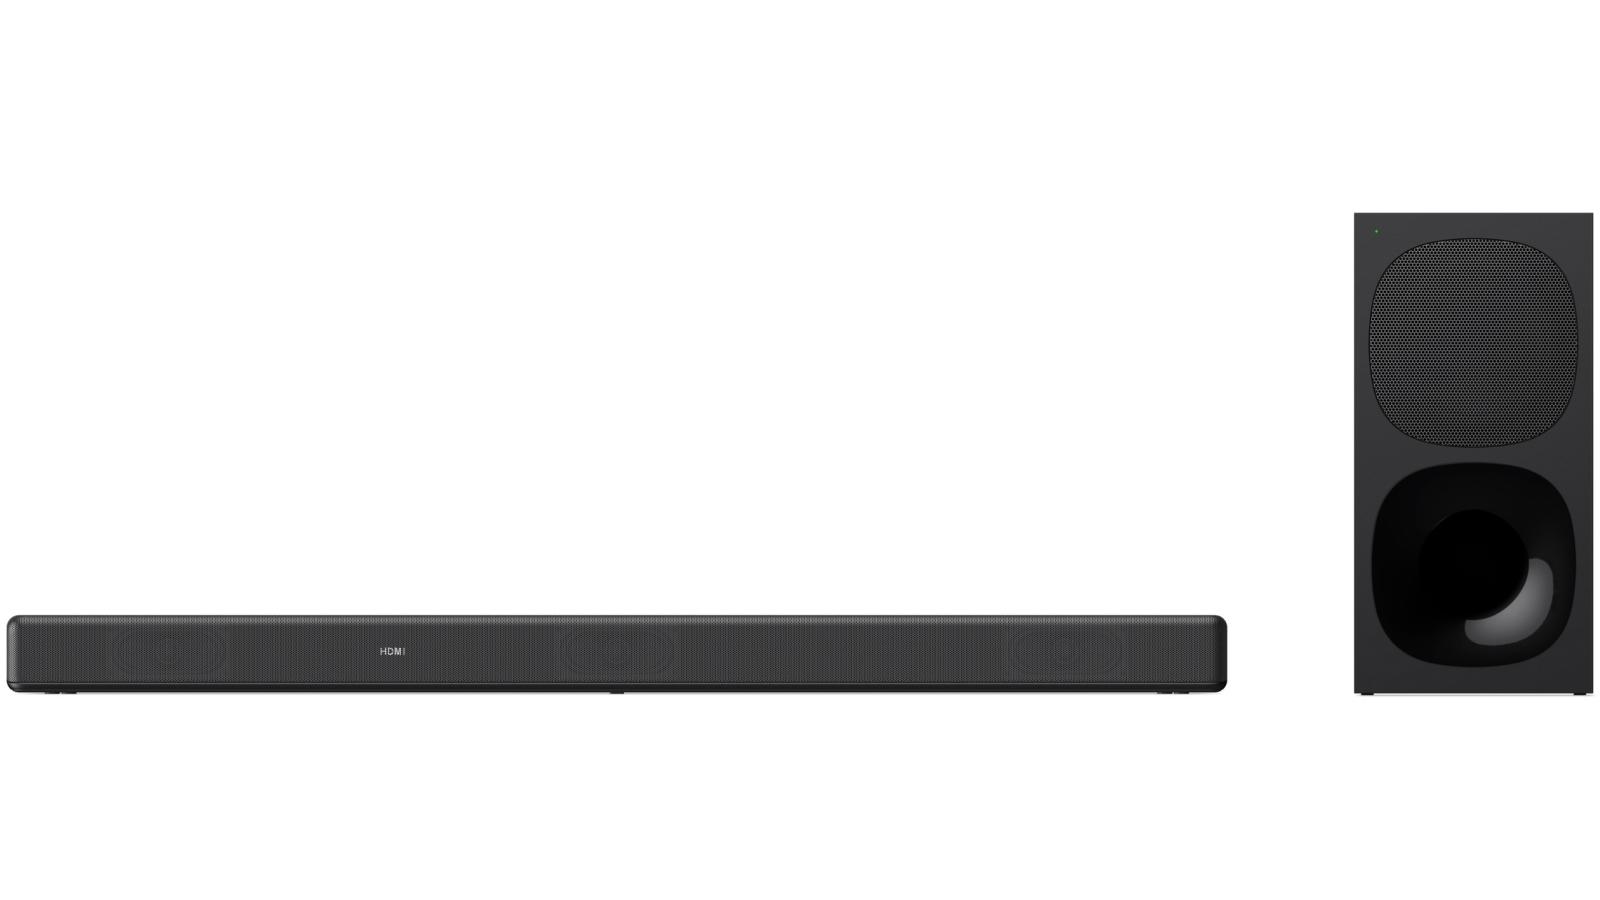 Image of Sony 3.1 Channel 400W Atmos Soundbar with Wireless Subwoofer